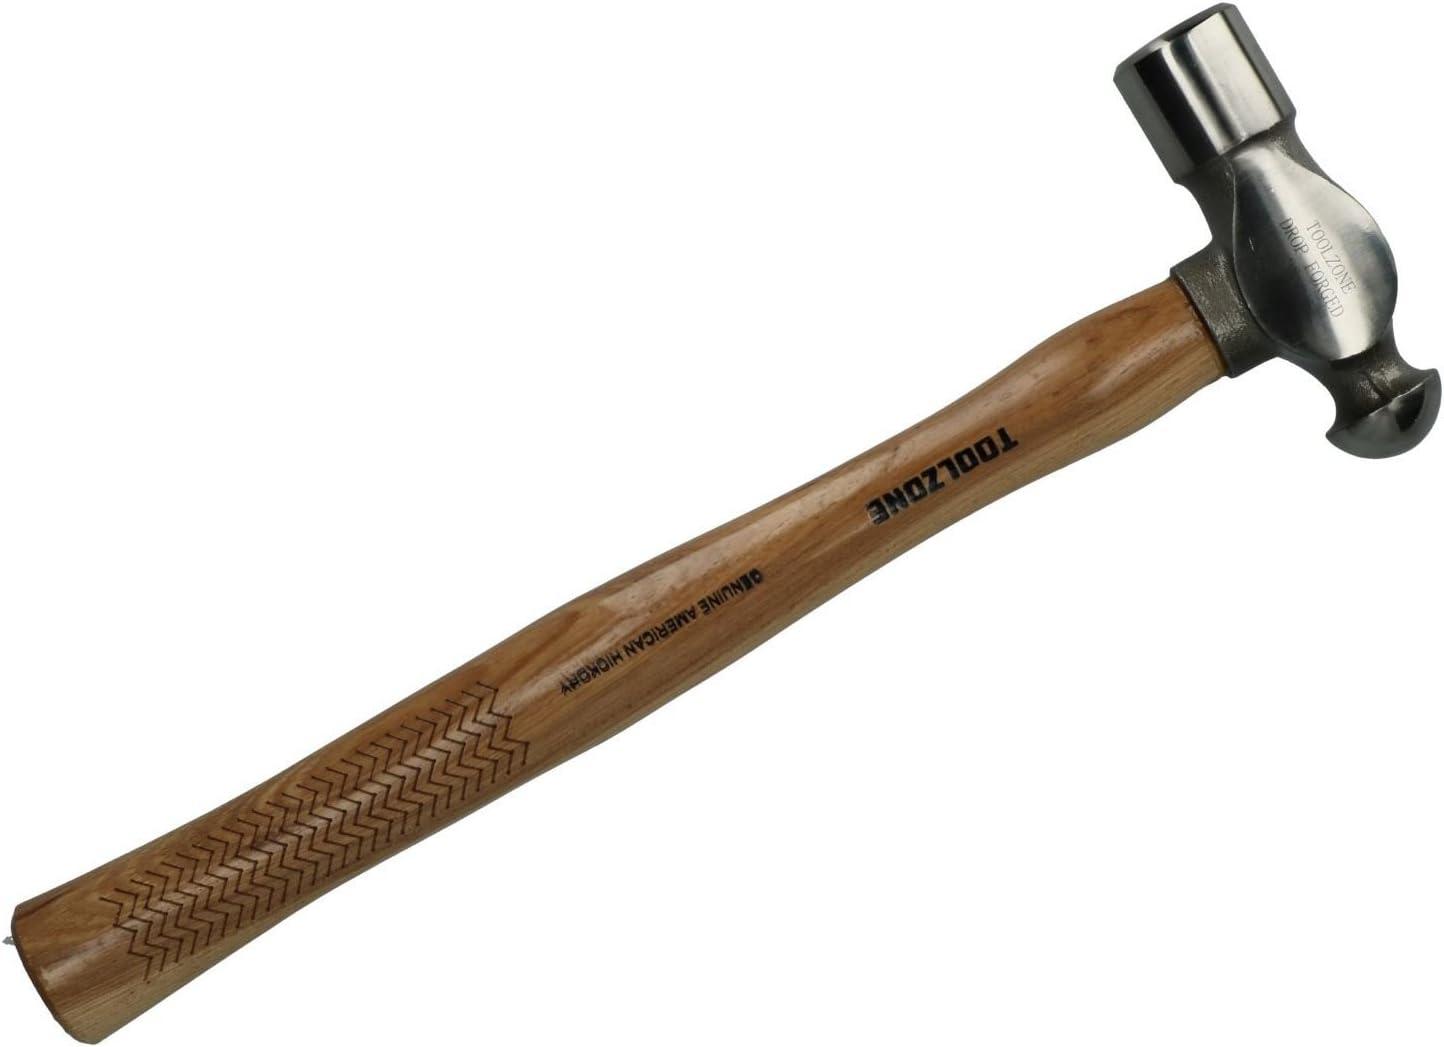 32oz American Hickory Ball Pein Omaha Mall Max 70% OFF Pin Fo Wooden Hammer Handle Drop